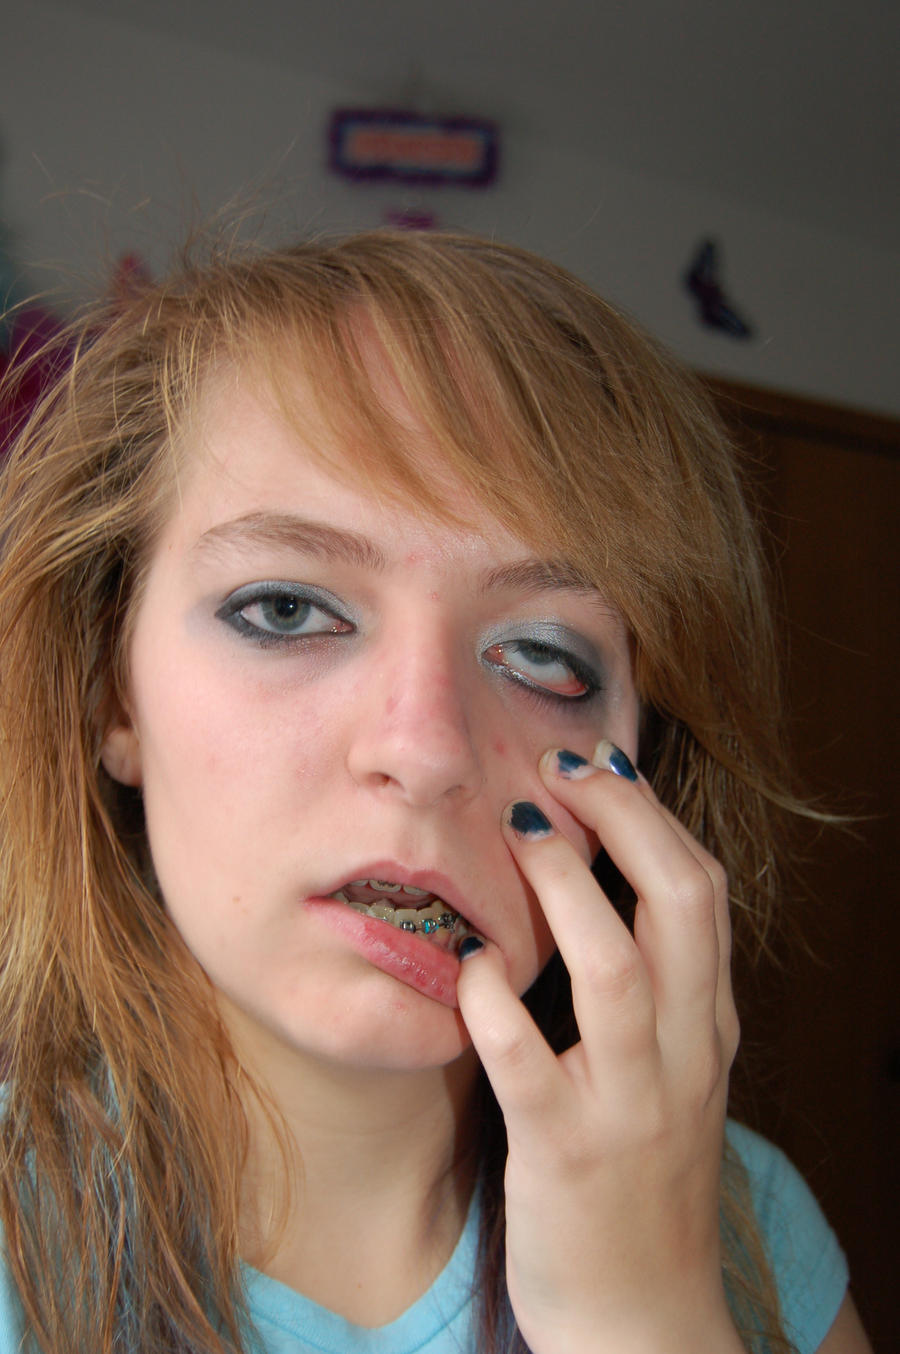 Robo Girl 16 - Face Melting